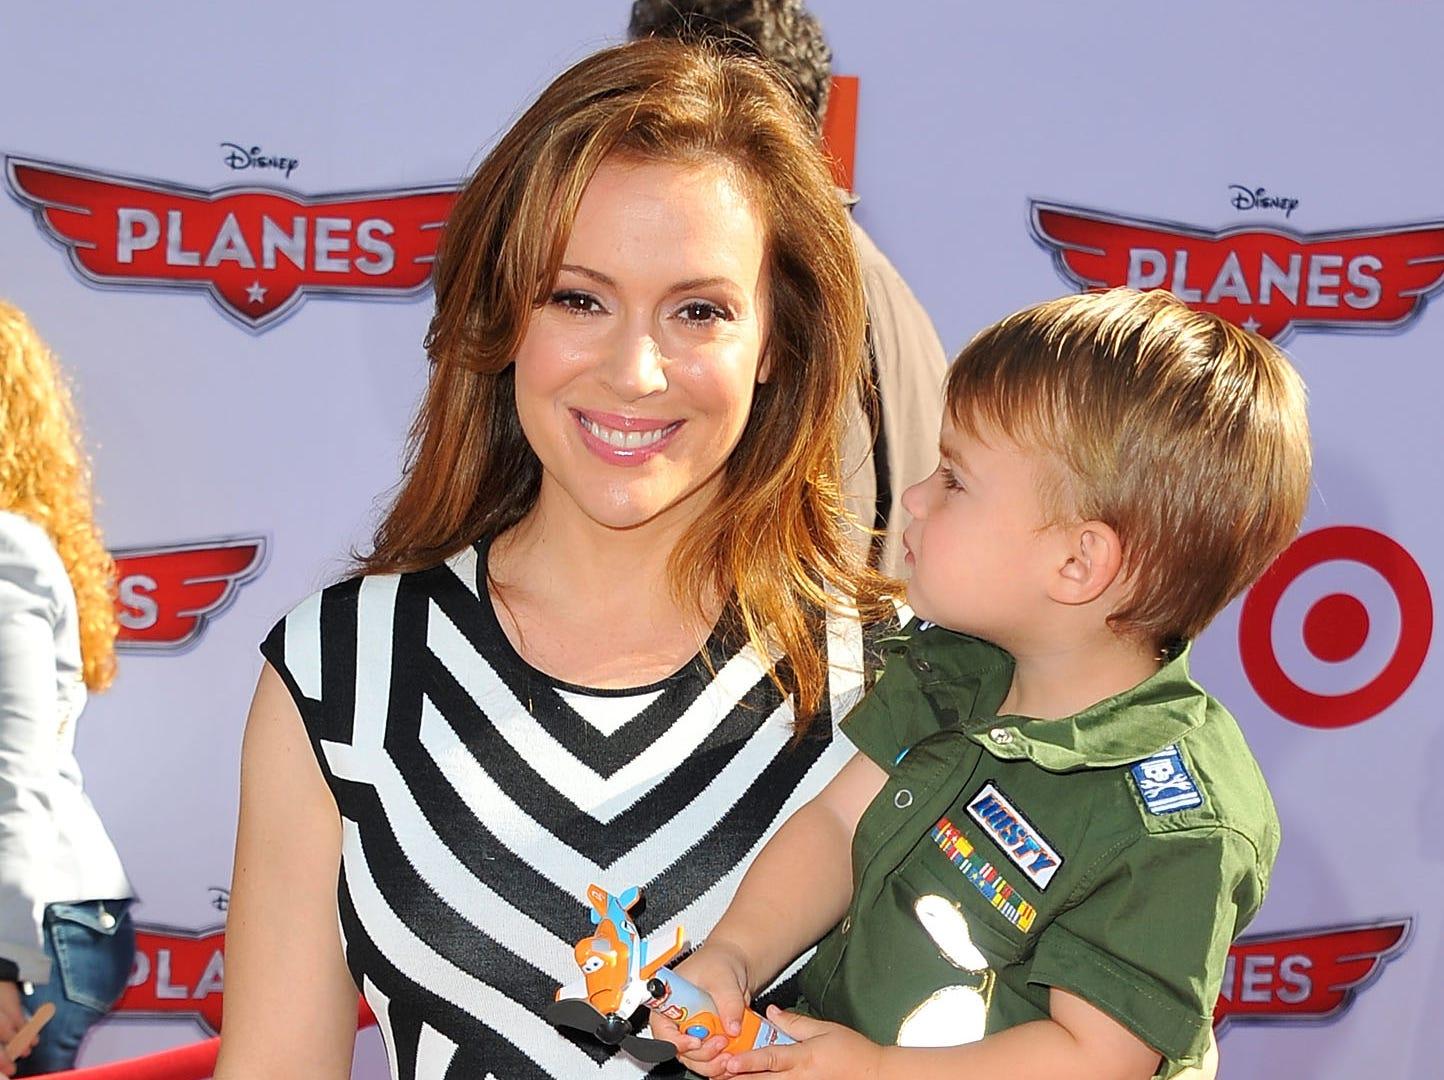 Alyssa Milano, along with son Milo Thomas Bugliari, shows off her love of stripes at the 'Planes' premiere.